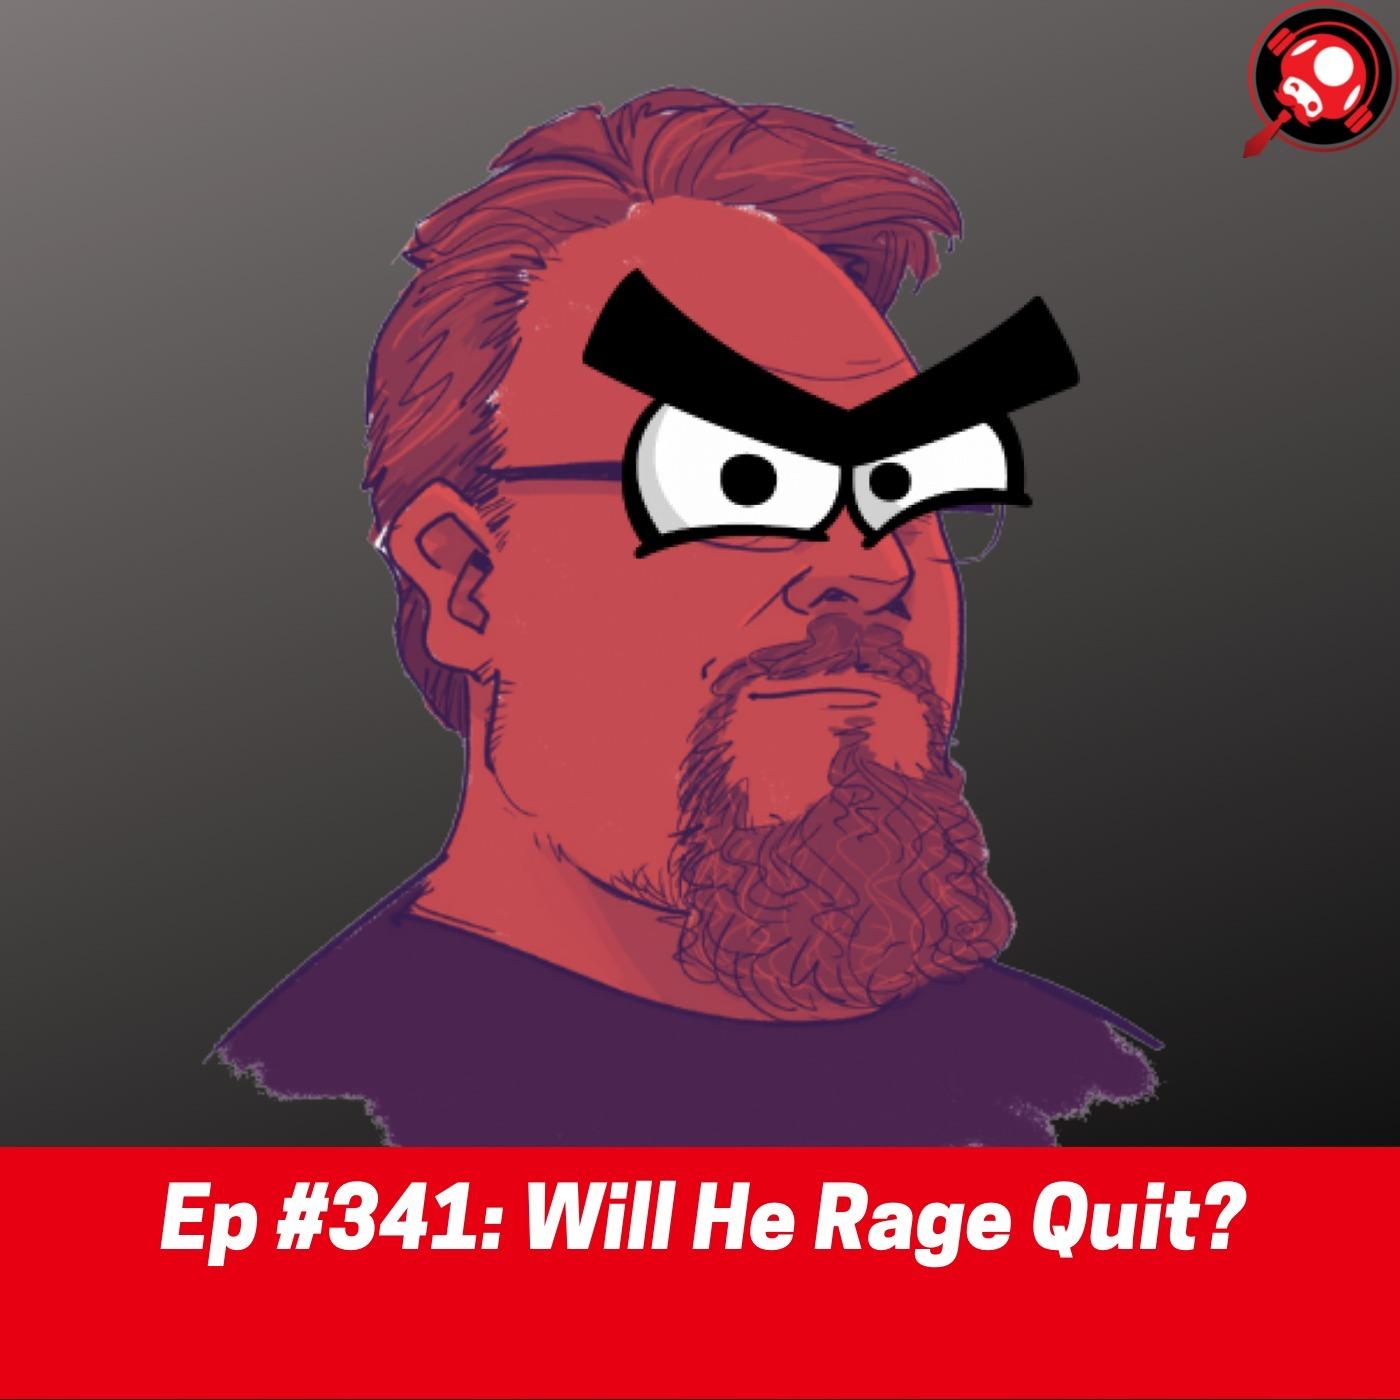 #341: Will He Rage Quit?